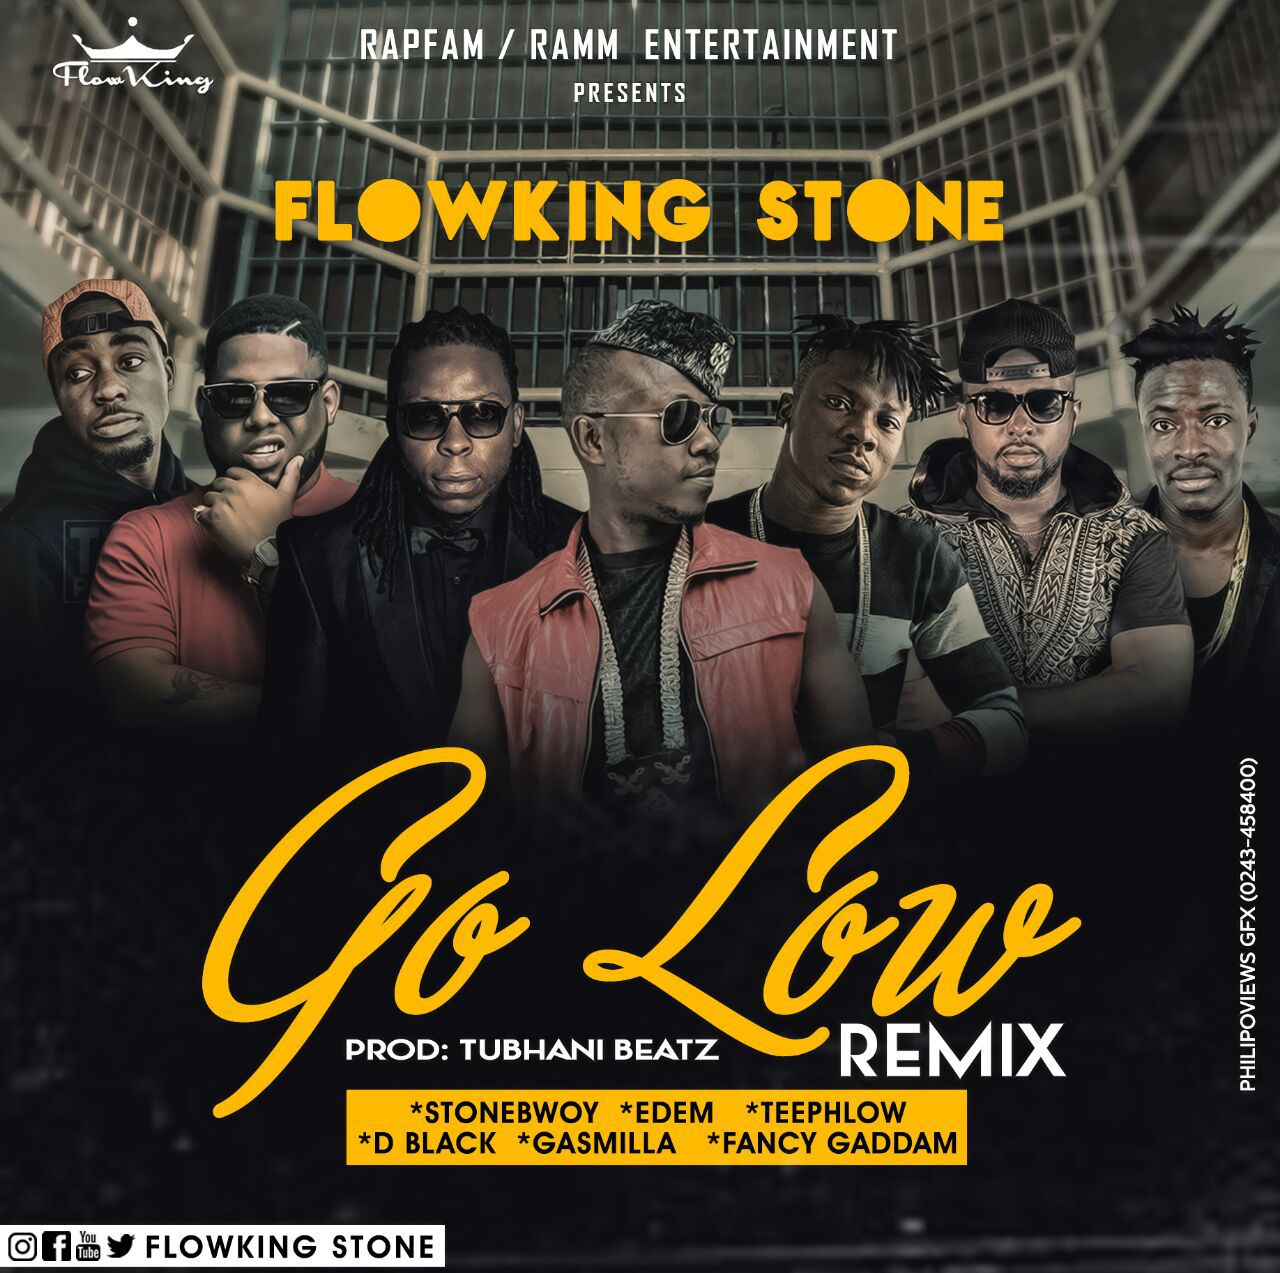 flowking-stone-go-low-remix-ft-stonebwoy-edem-d-black-teephlow-gasmilla-fancy-gadam